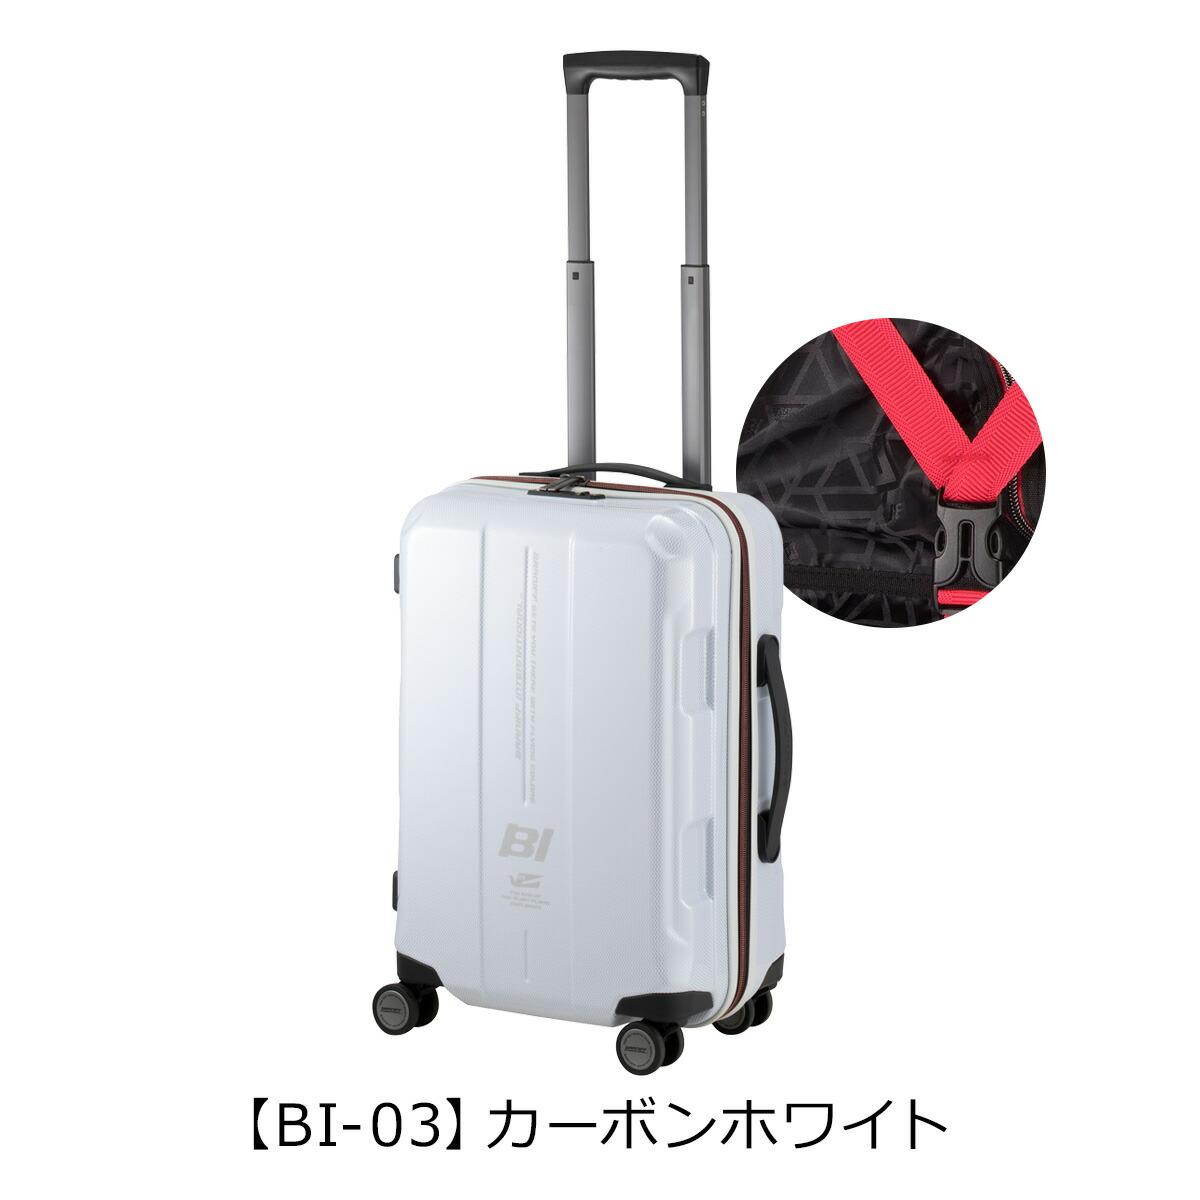 【BI-03】カーボンホワイト